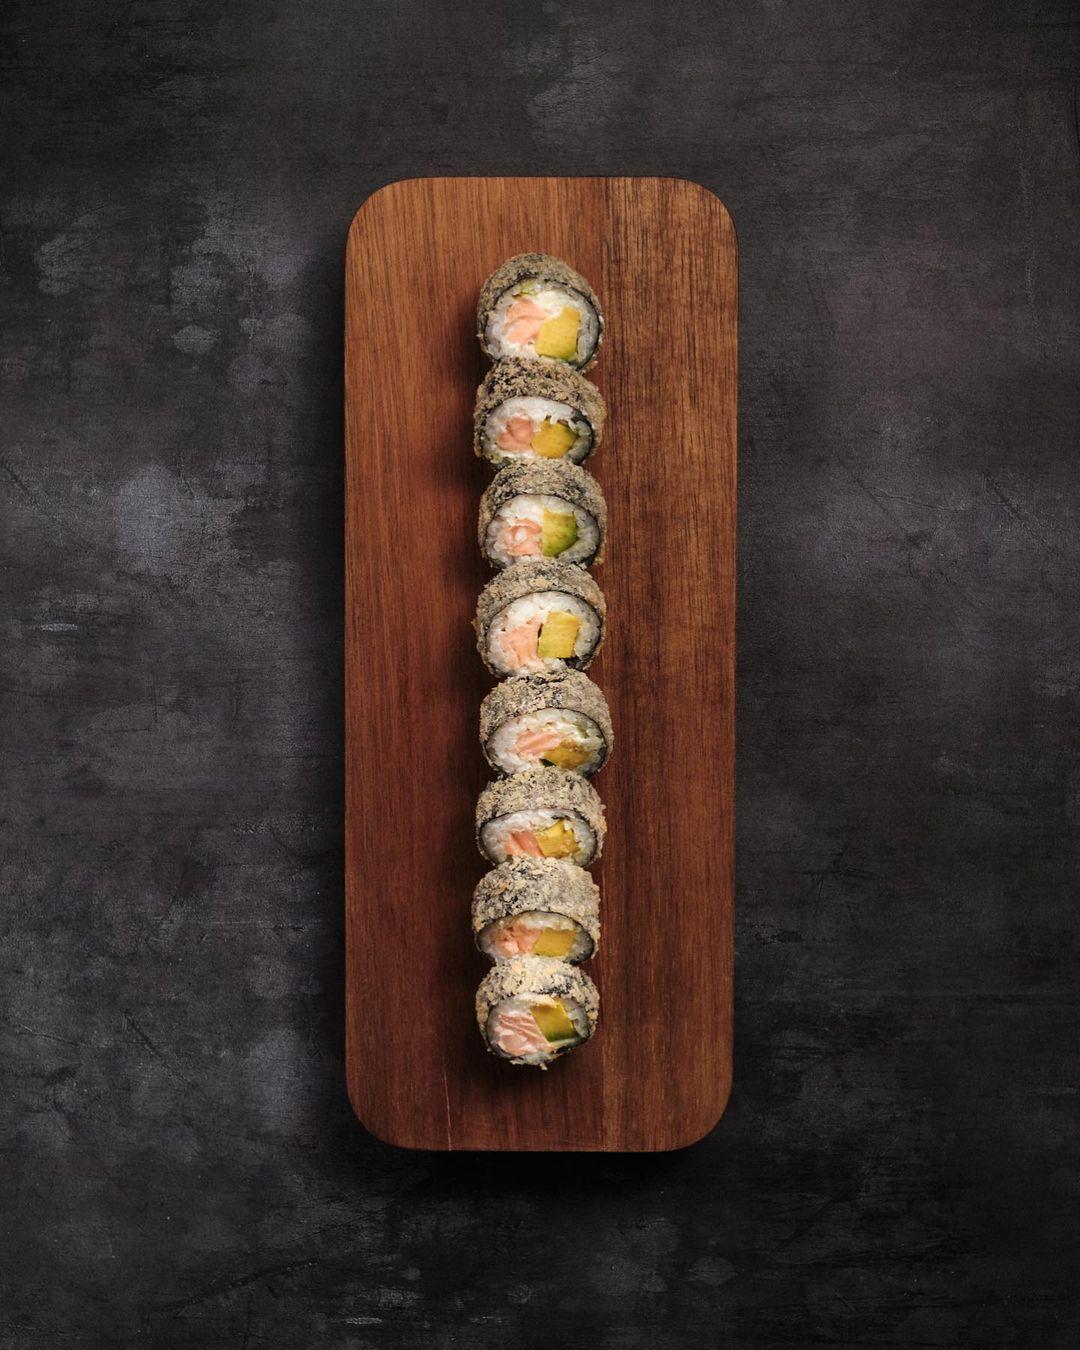 sushi fotografía cenital